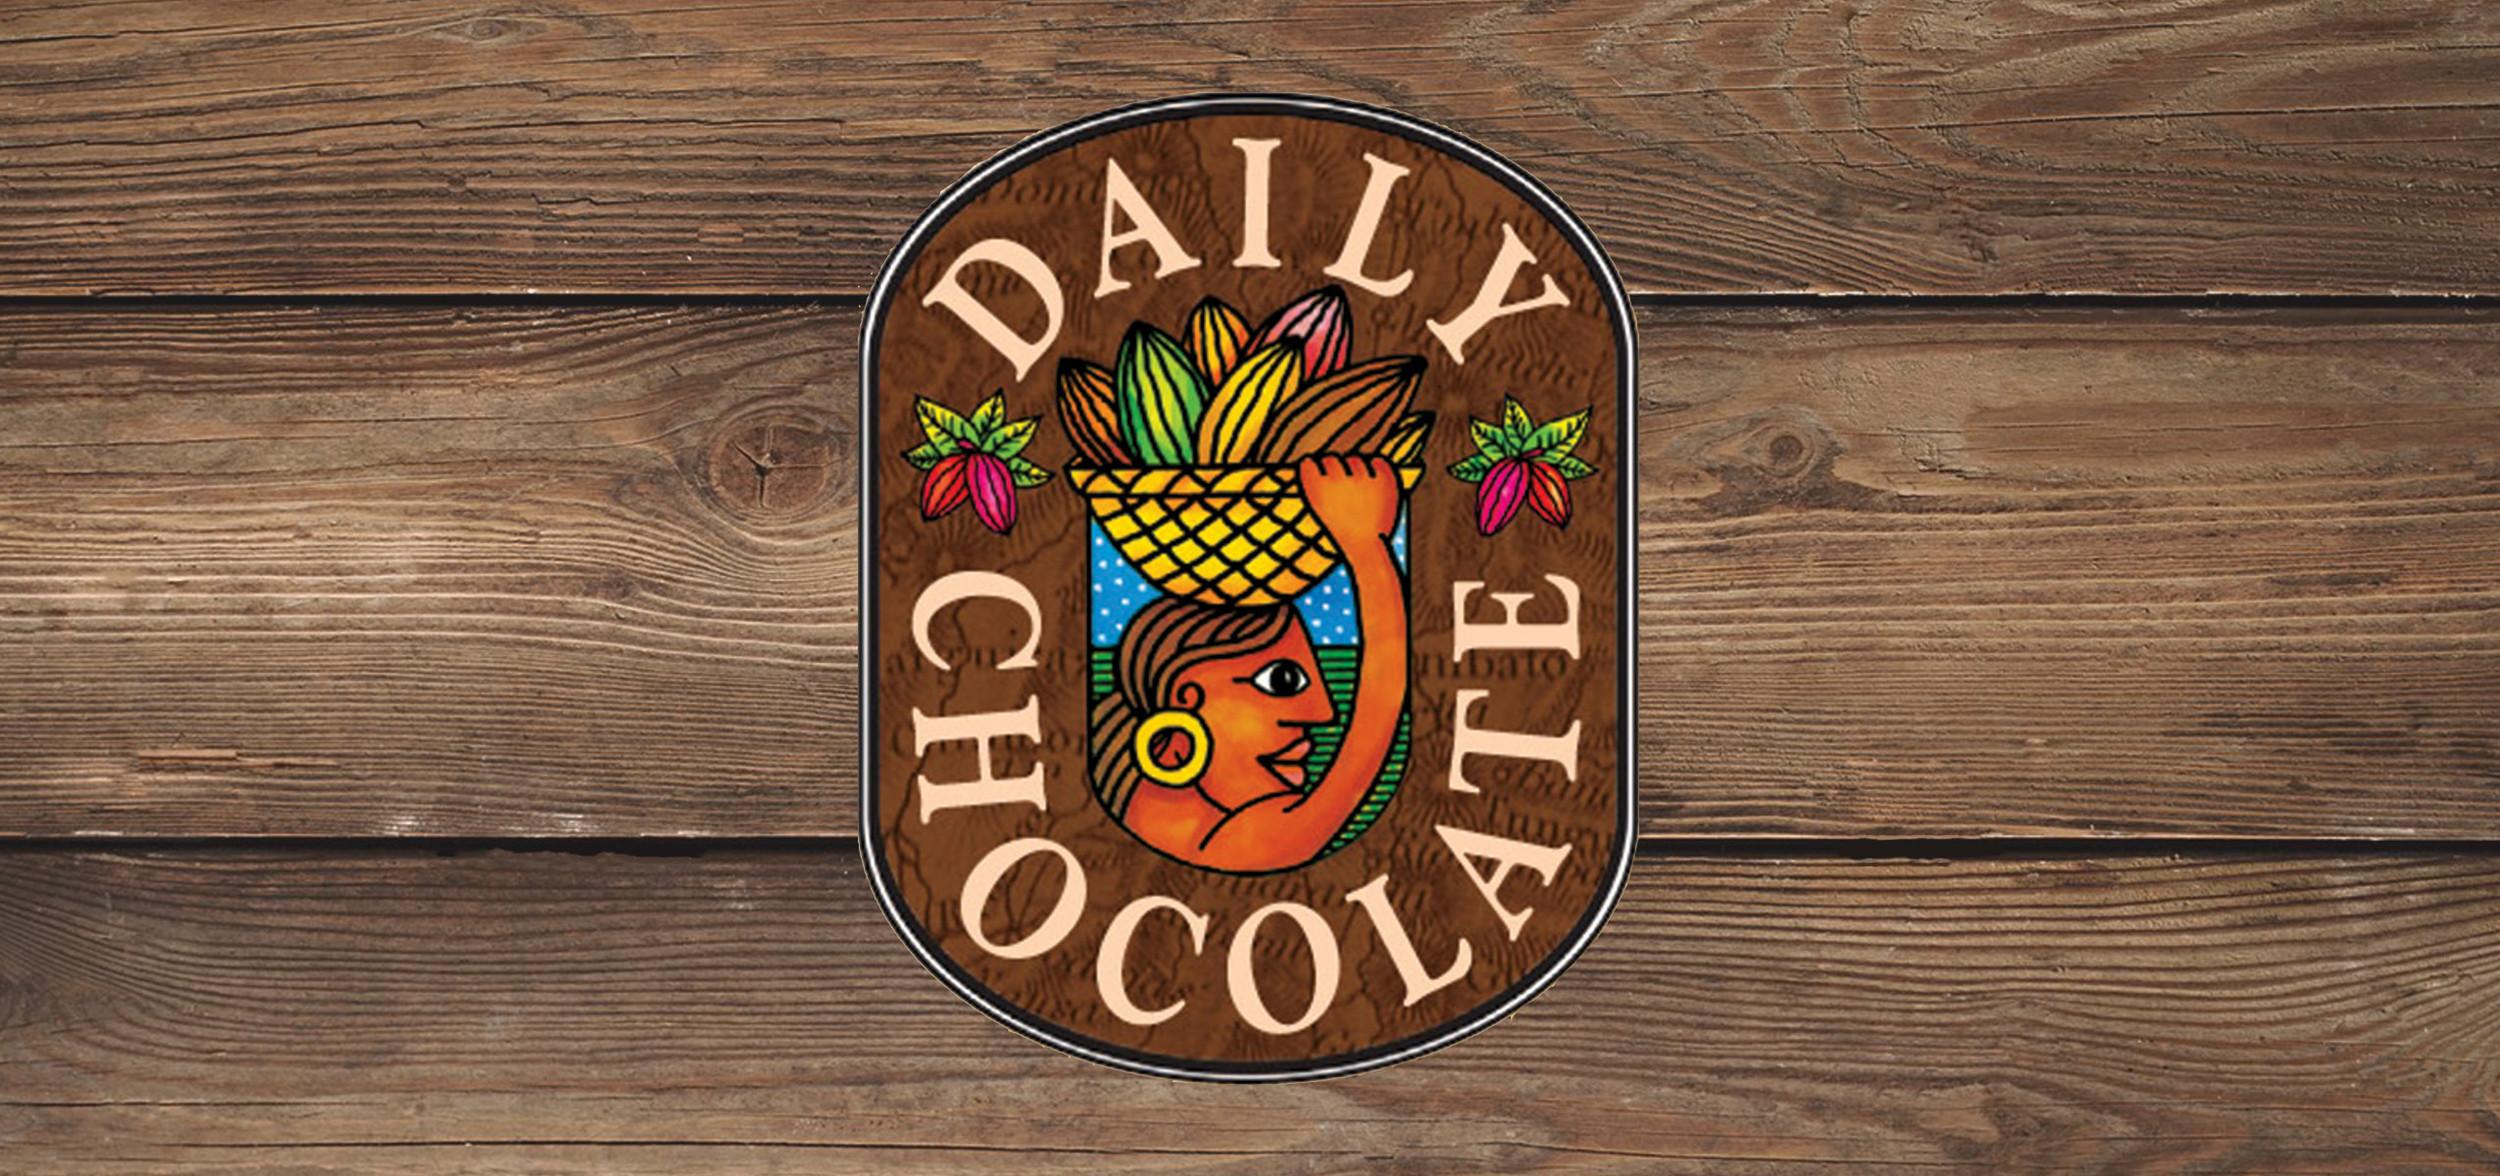 (c) Dailychocolate.net